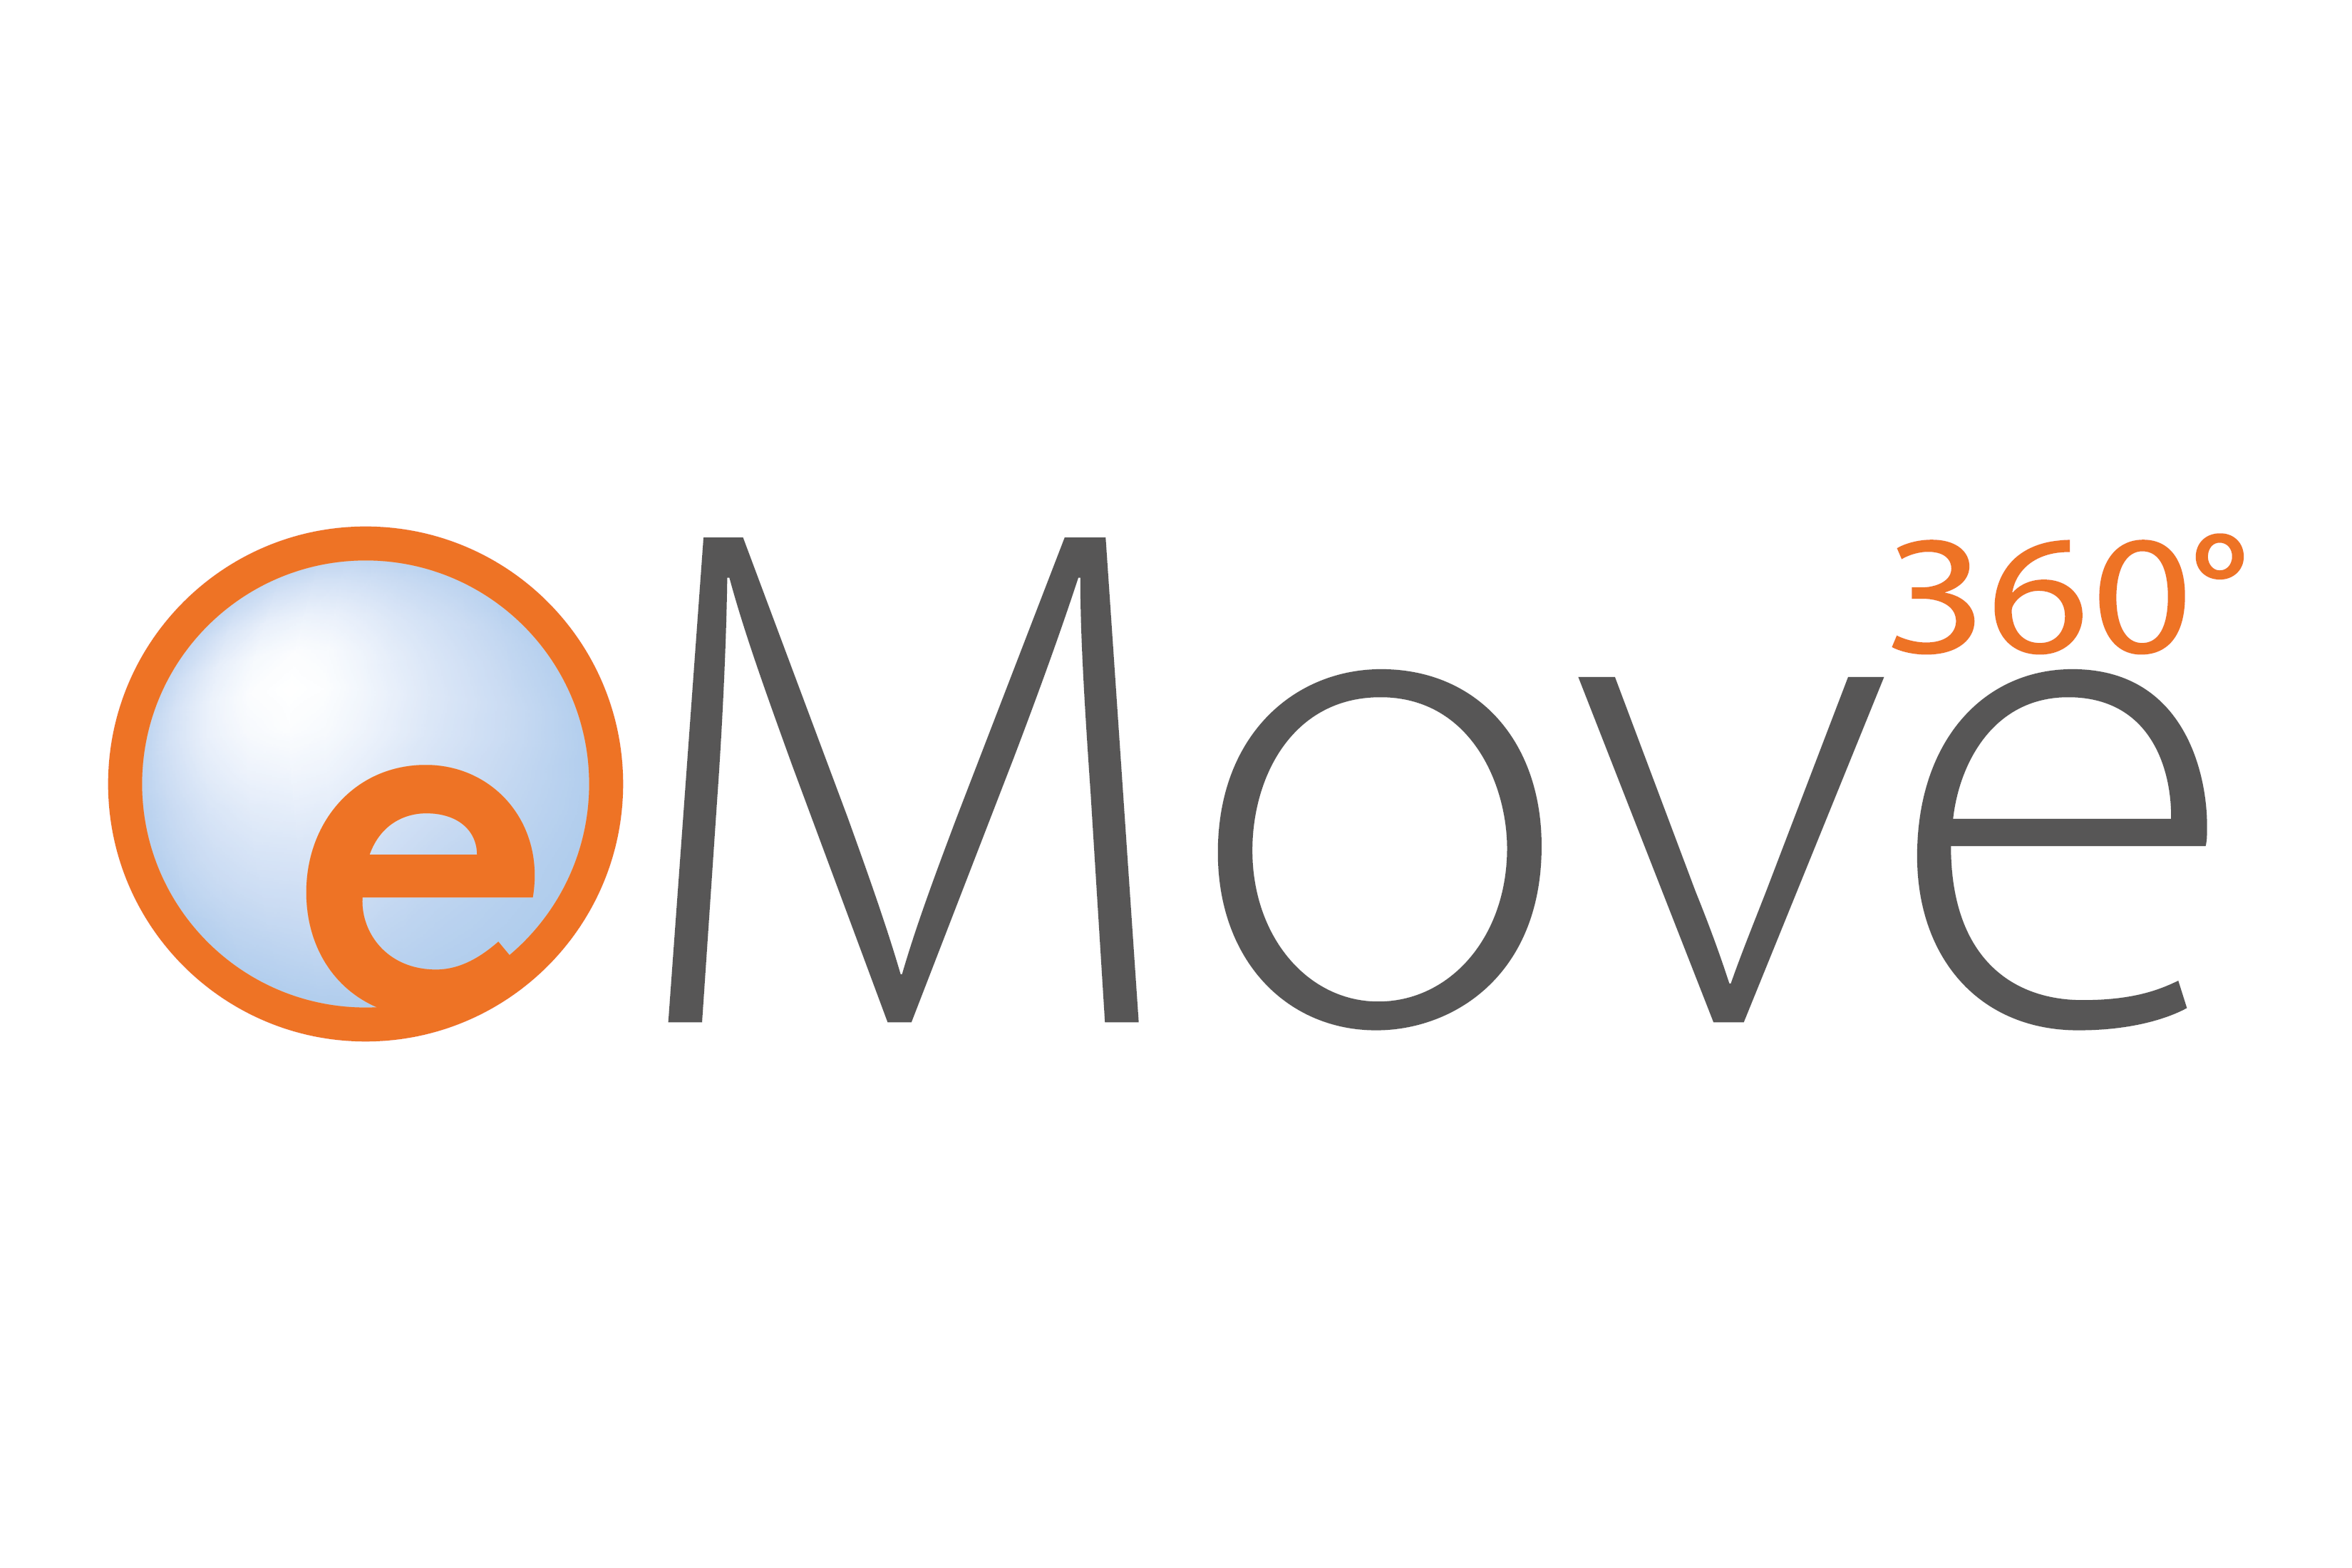 Logo eMove 360